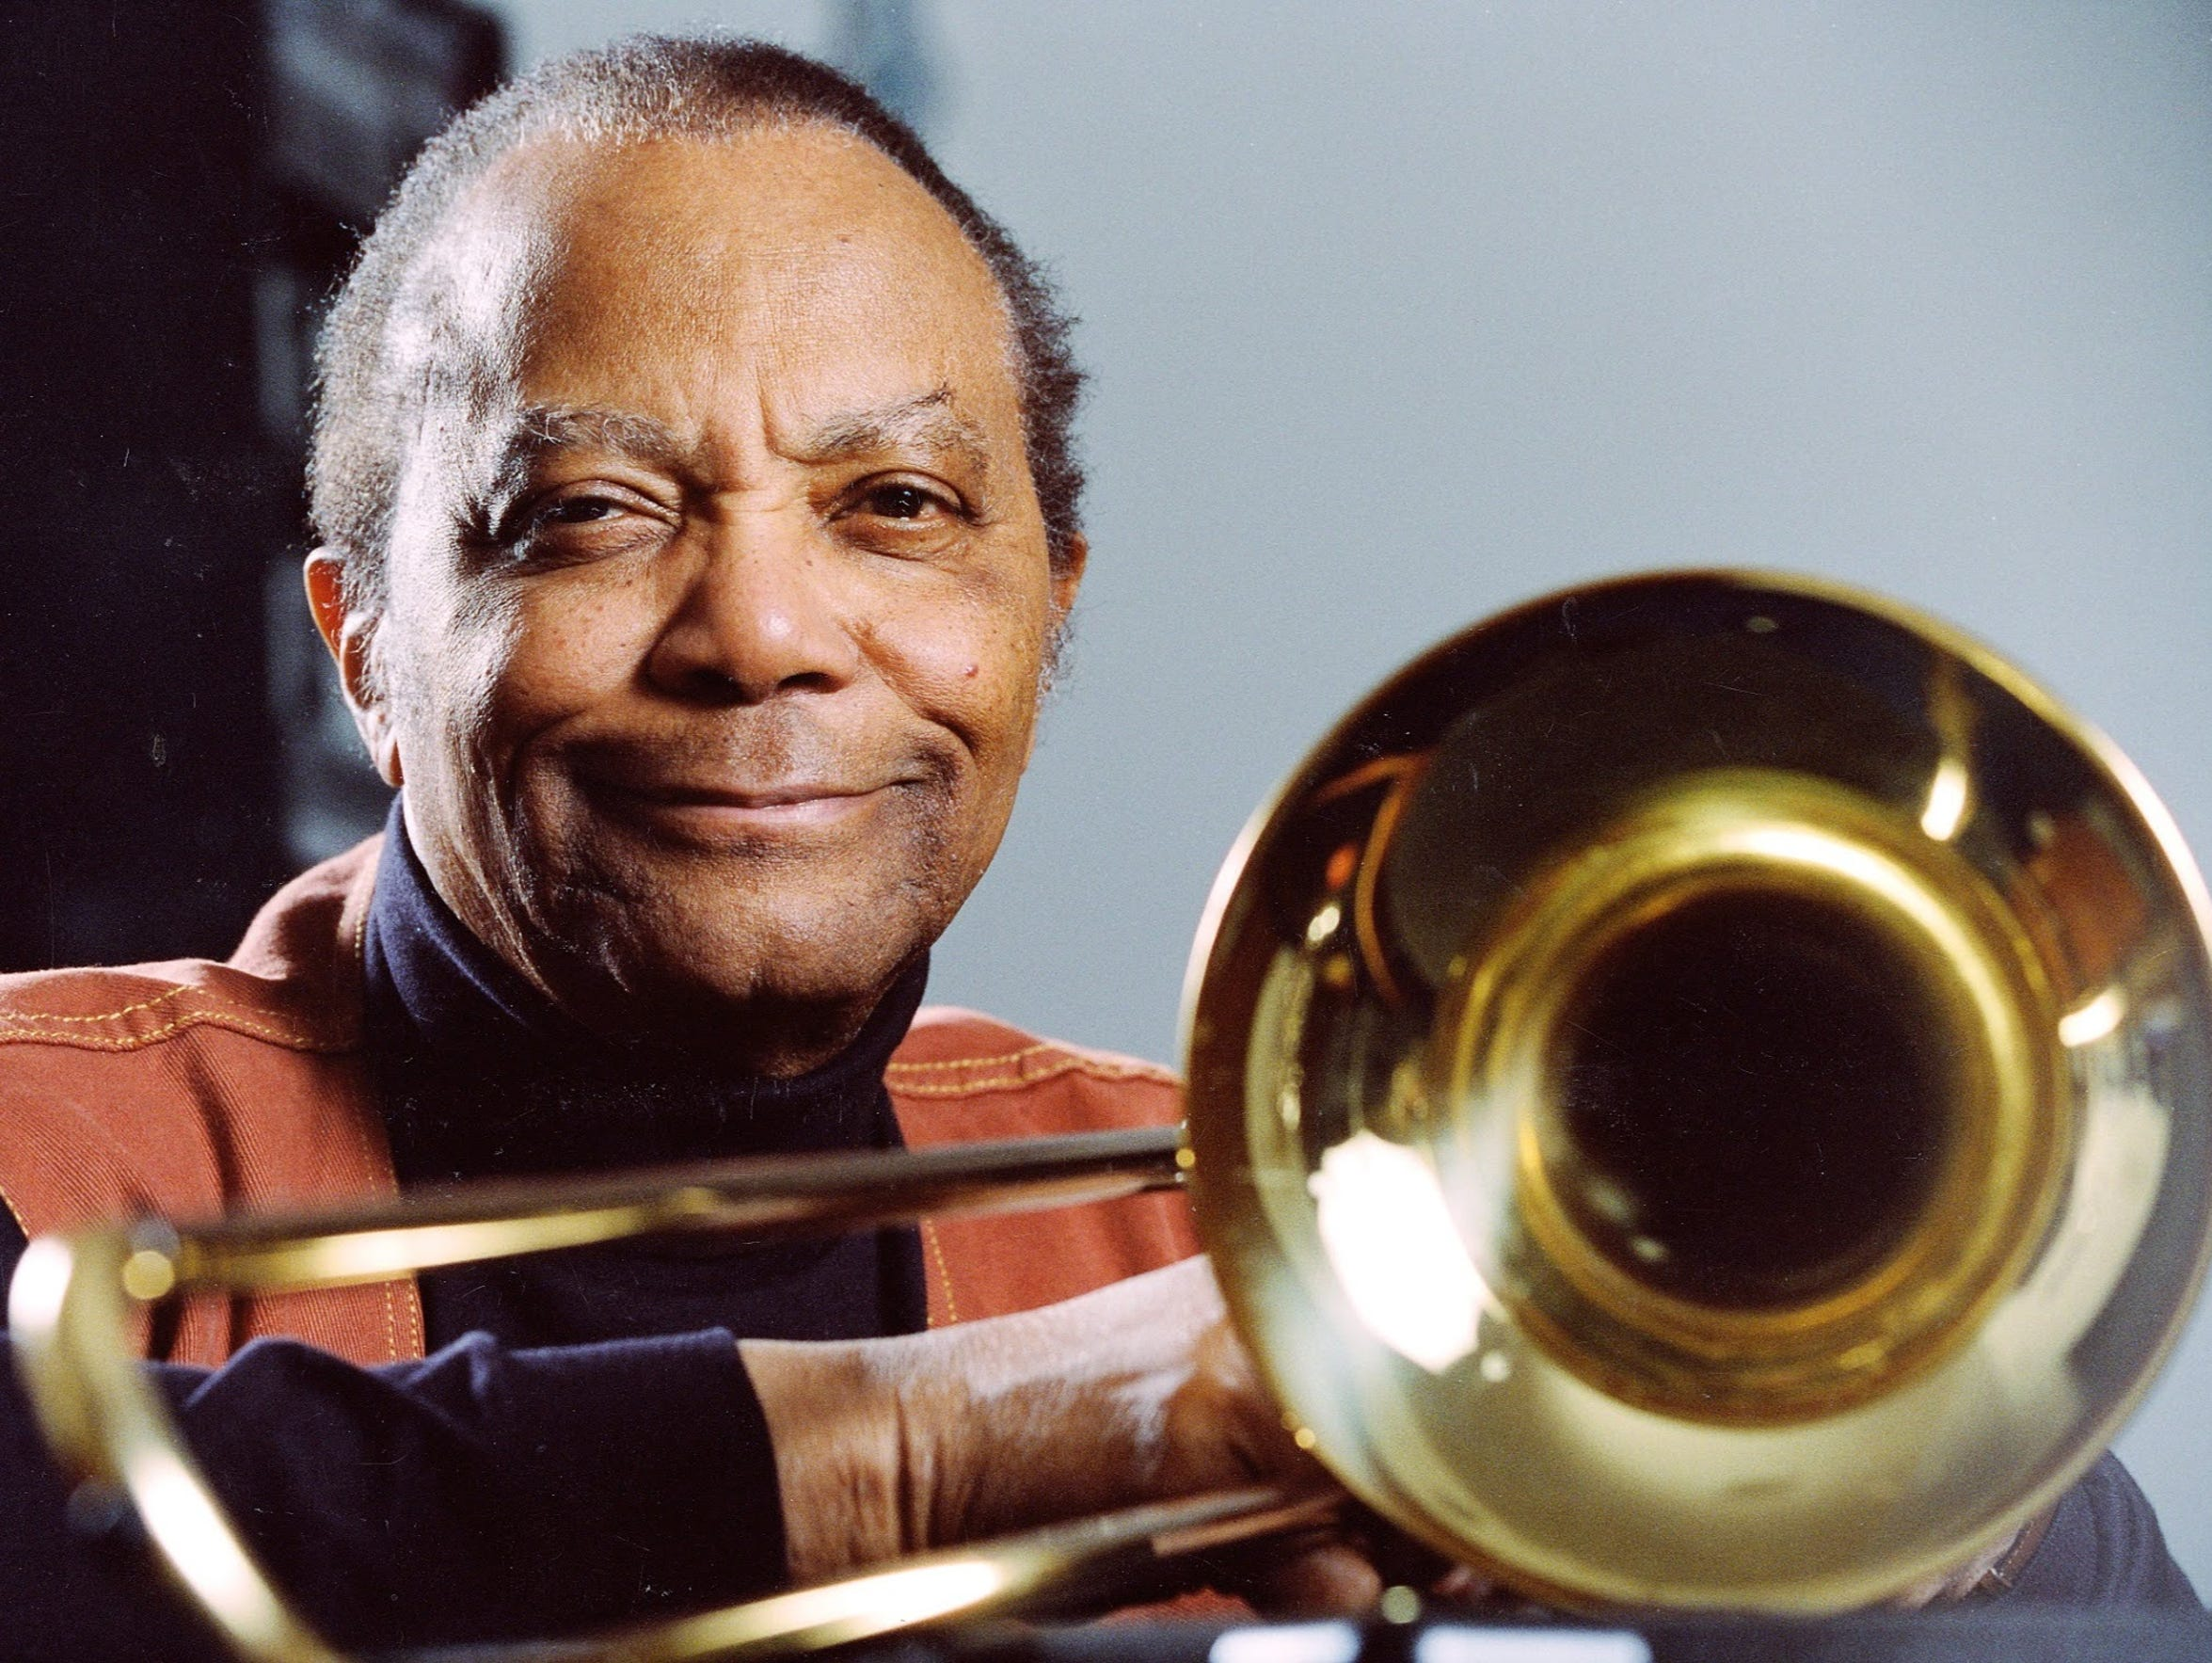 J.J. Johnson made the trombone a high-profile instrument